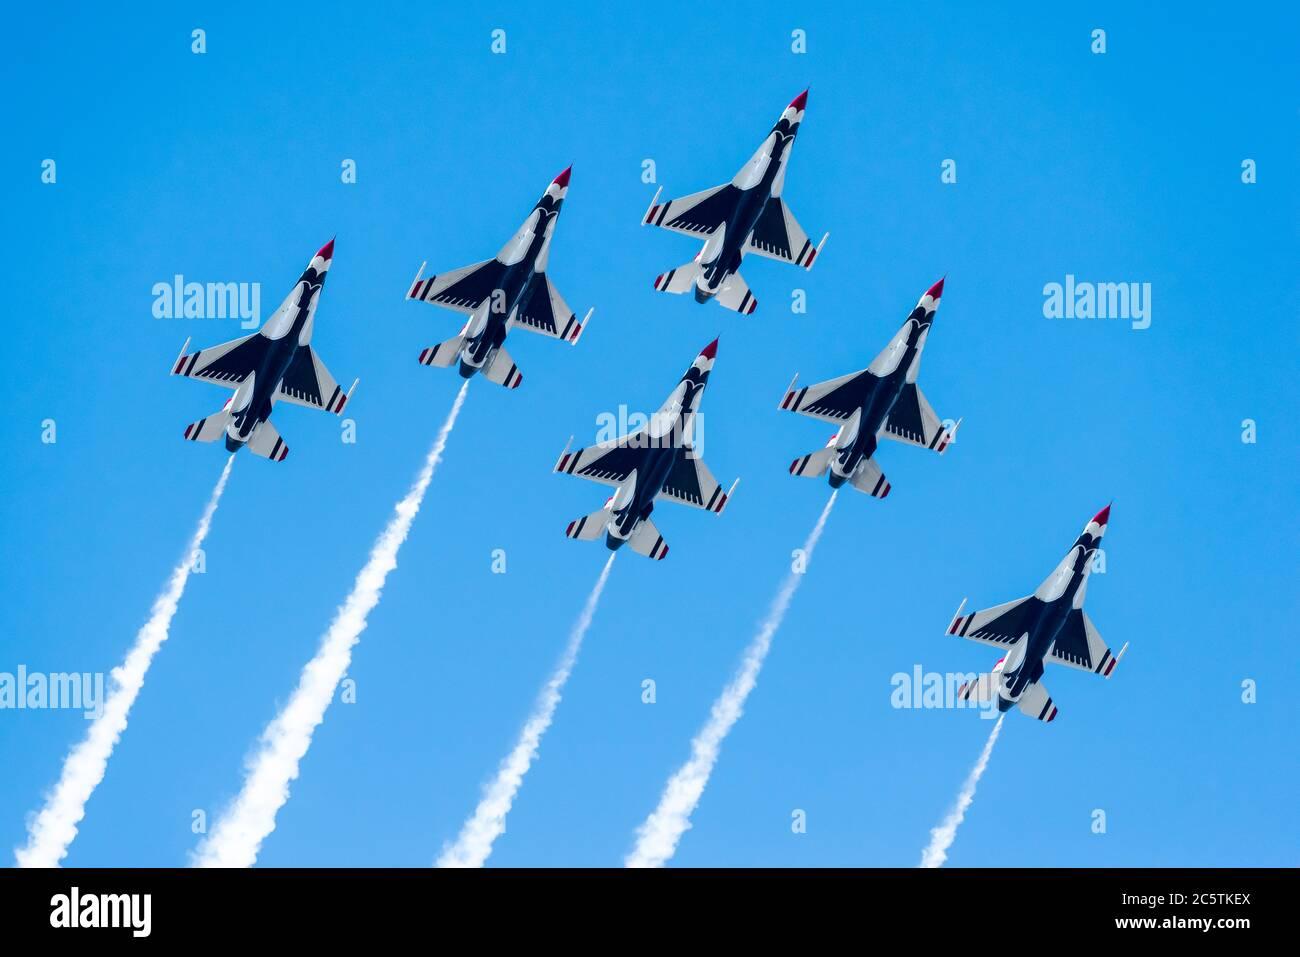 Boston, Massachusetts. Juli 2020. USAF Thunderbirds fliegen beim DOD Salute to America 2020 Überflug. Stockfoto